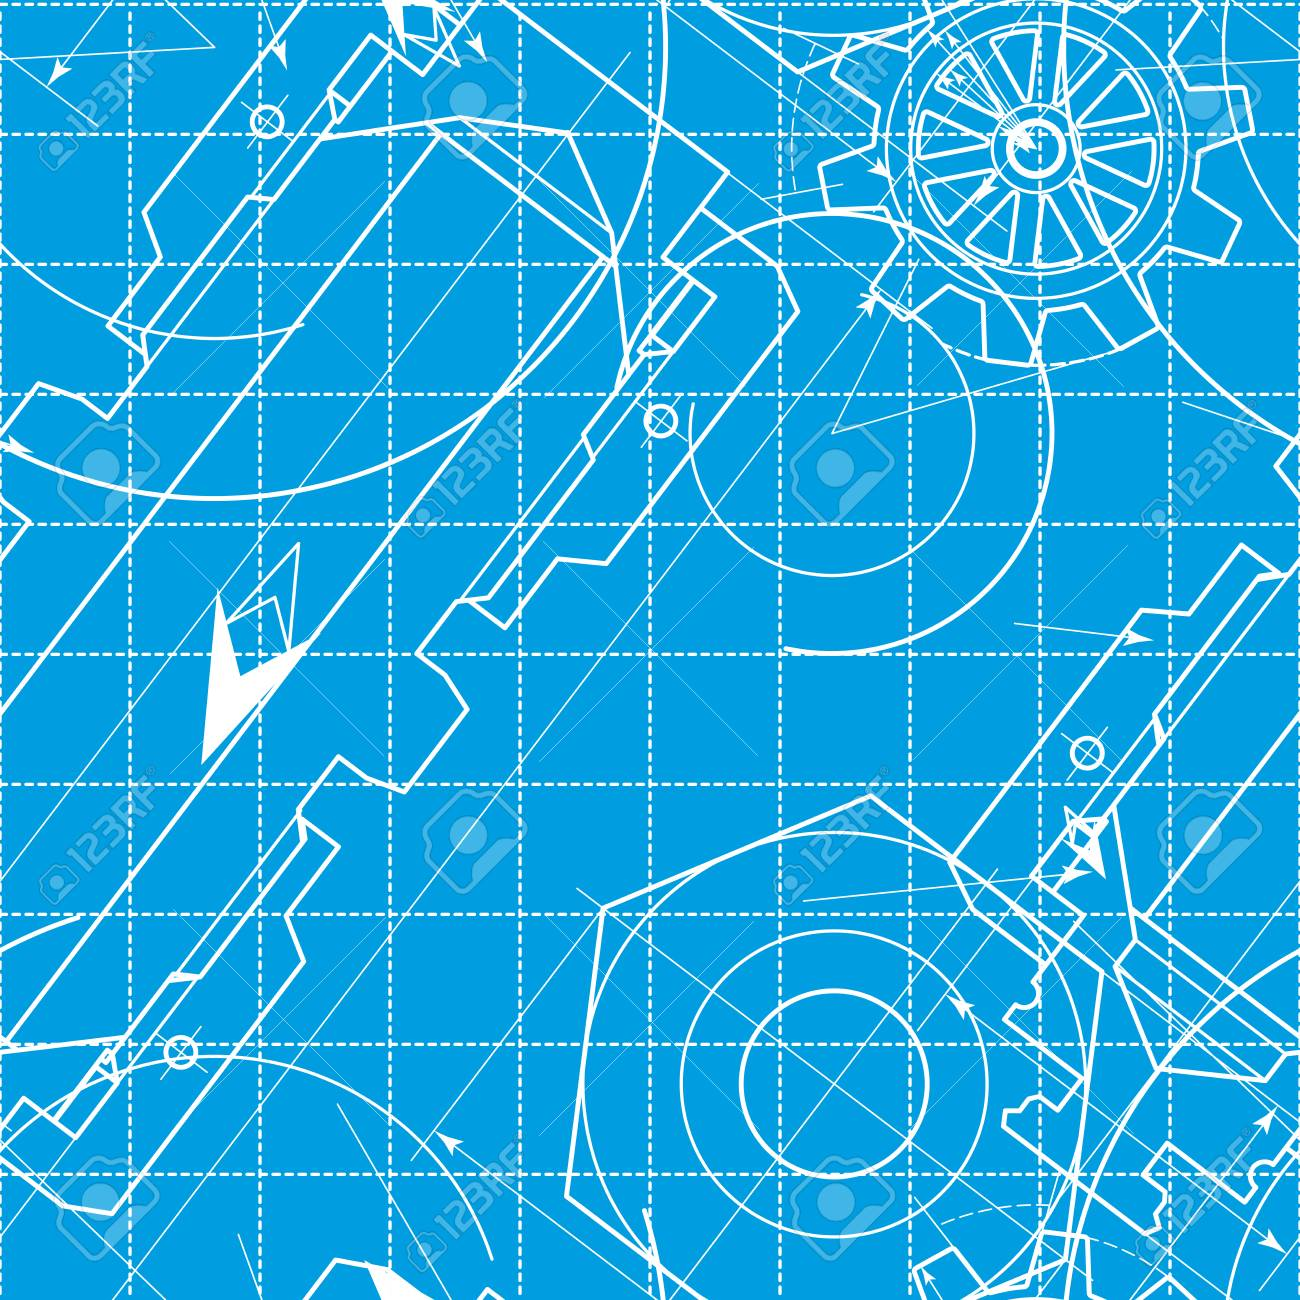 Blueprint pattern with gears stock photo picture and royalty free blueprint pattern with gears stock photo 45327798 malvernweather Choice Image